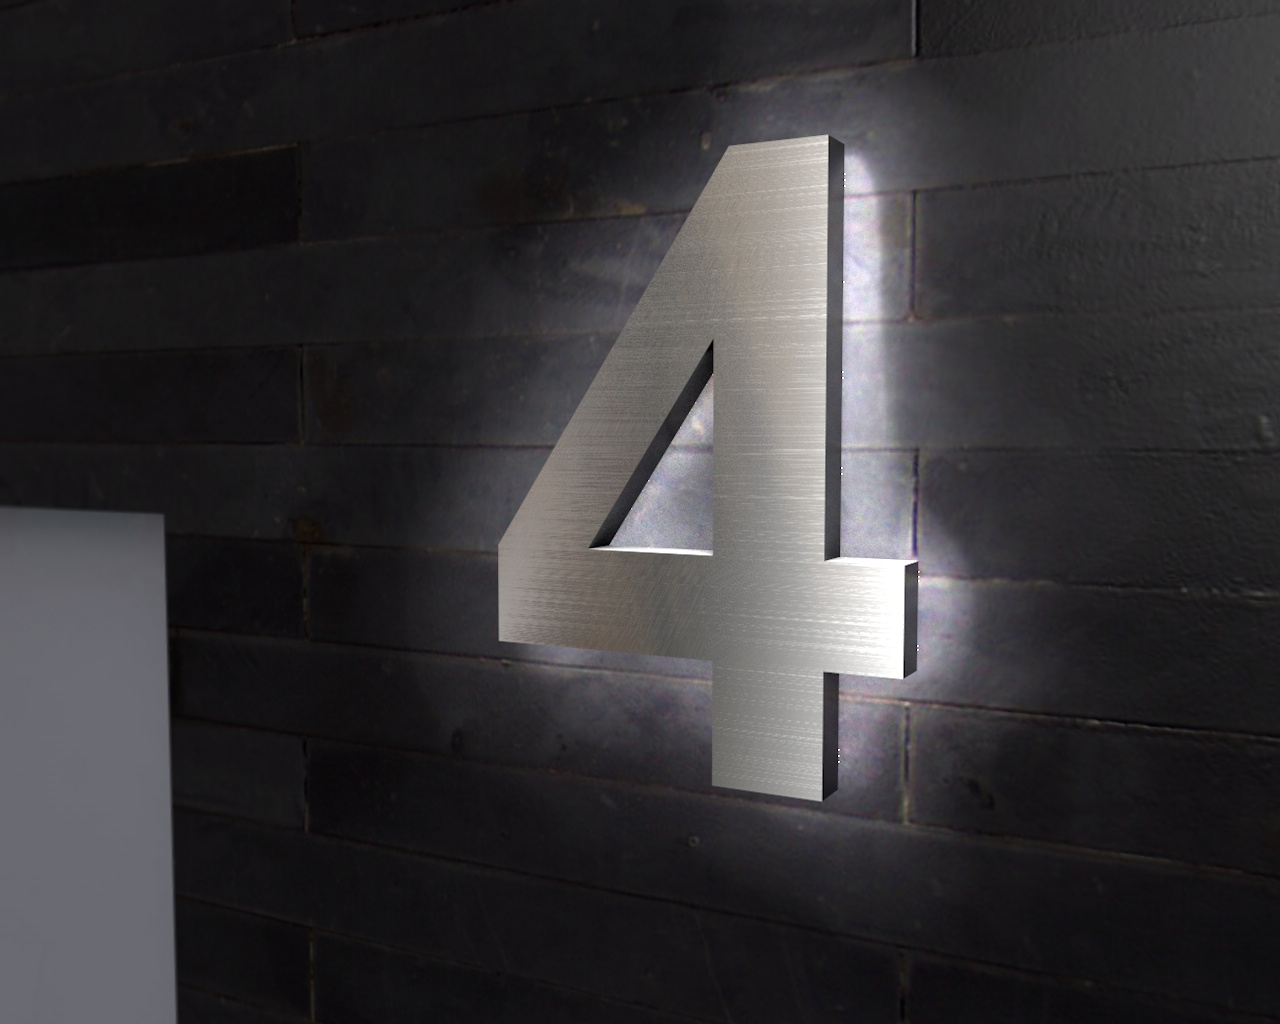 Beleuchtete Hausnummer 4 Ambilight